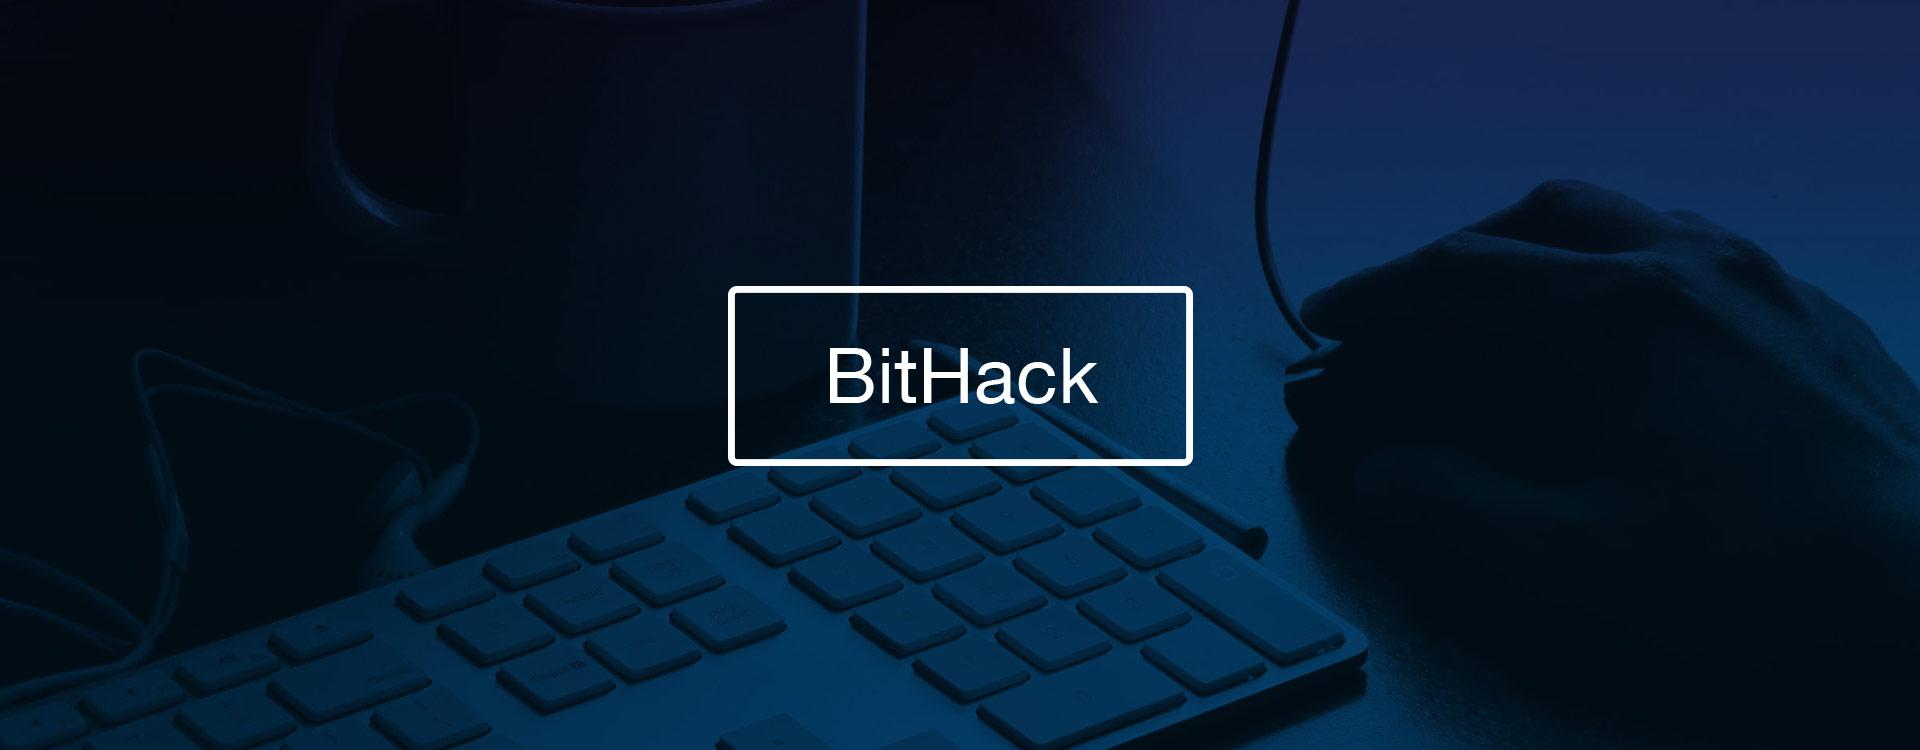 bithack-header